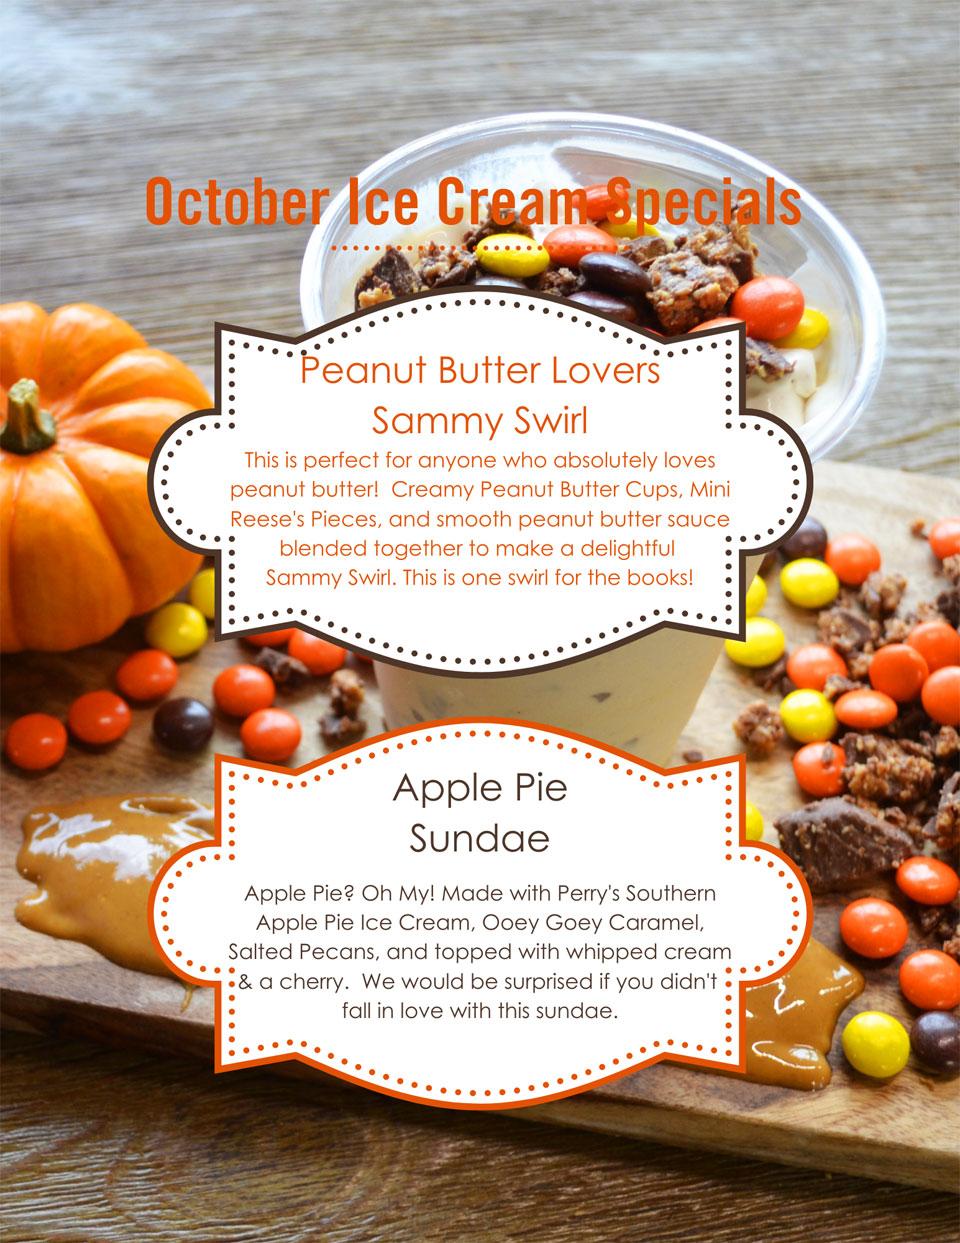 october-ice-cream-specials-platters-chocolates.jpg